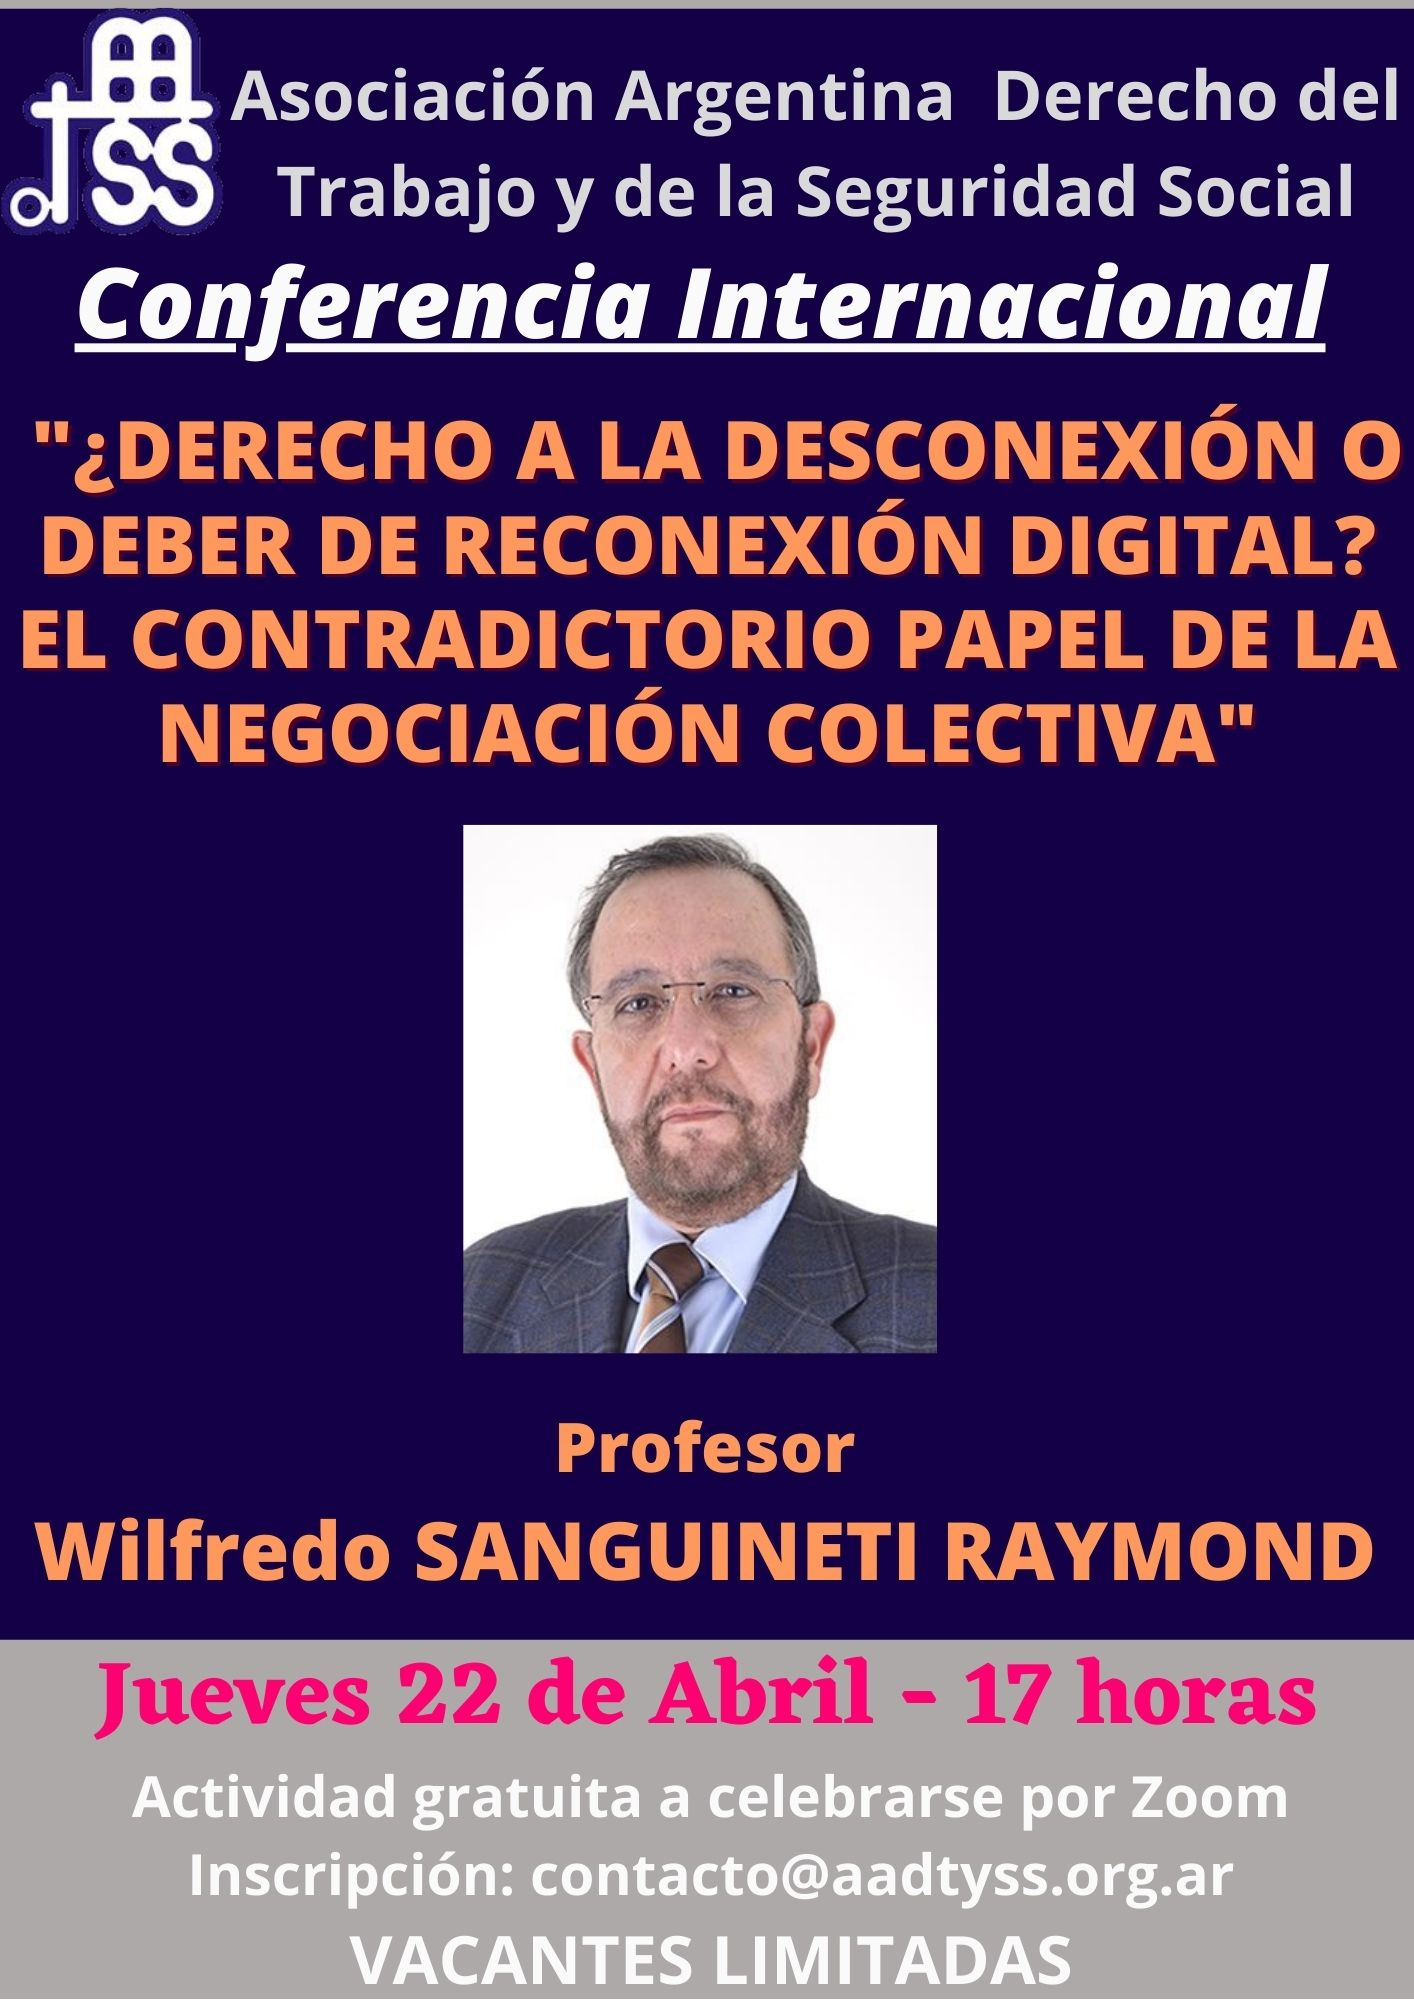 vvideoconferencia argentina desconexion WSANGUINETI